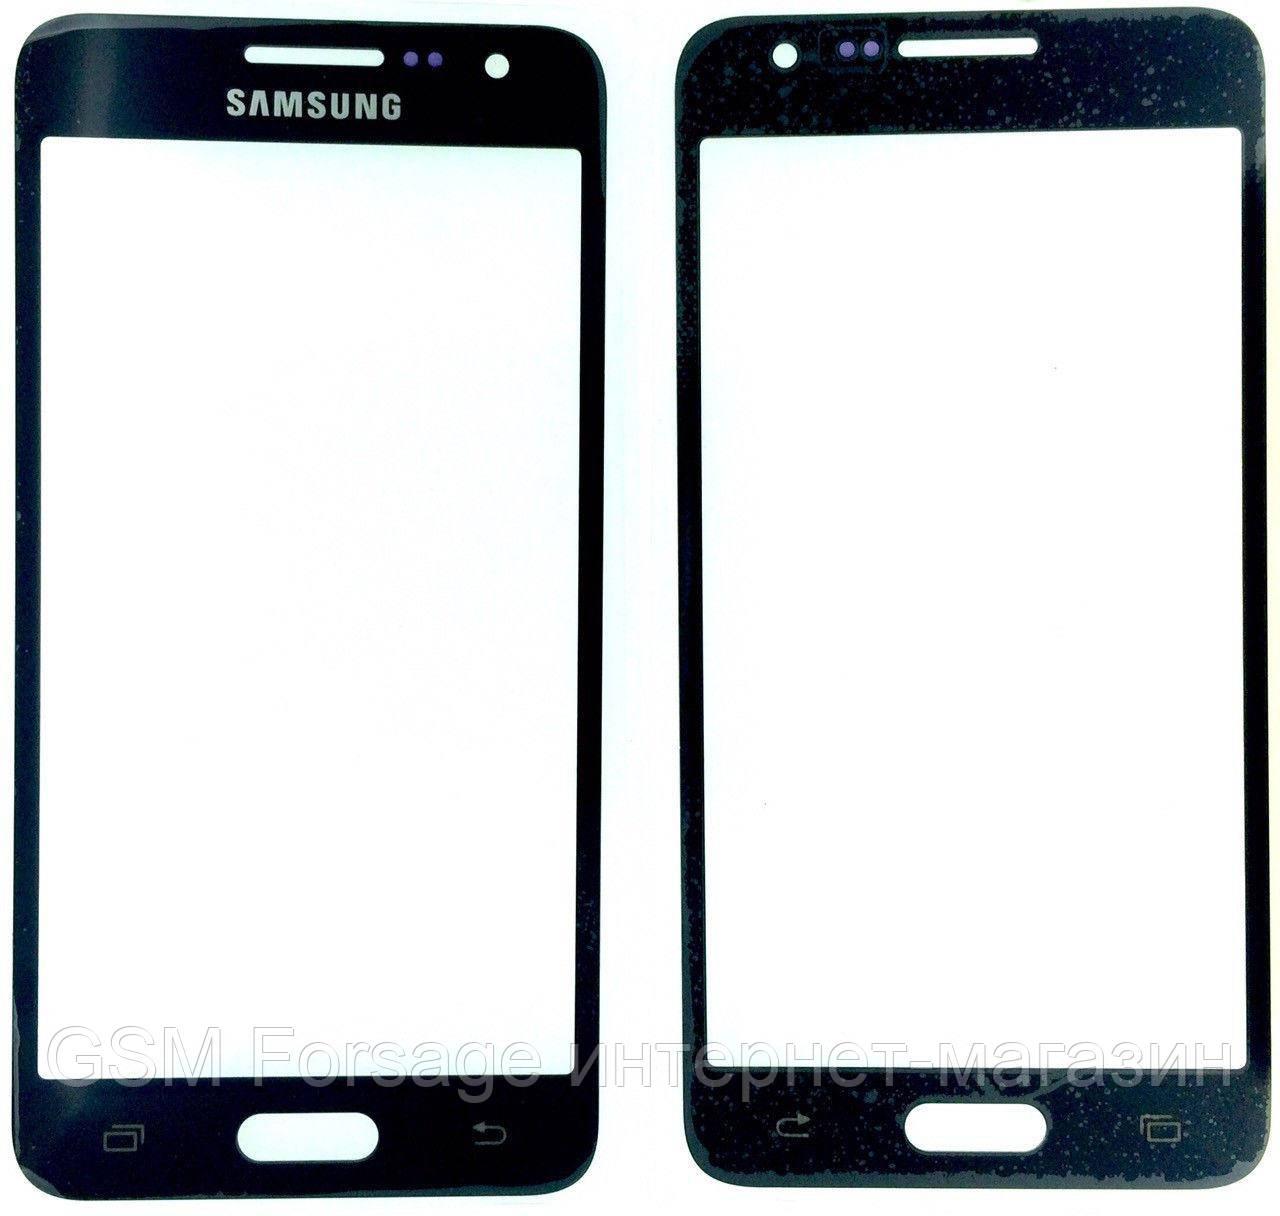 Стекло дисплея Samsung Galaxy A3 SM-A300F Black (для переклейки)